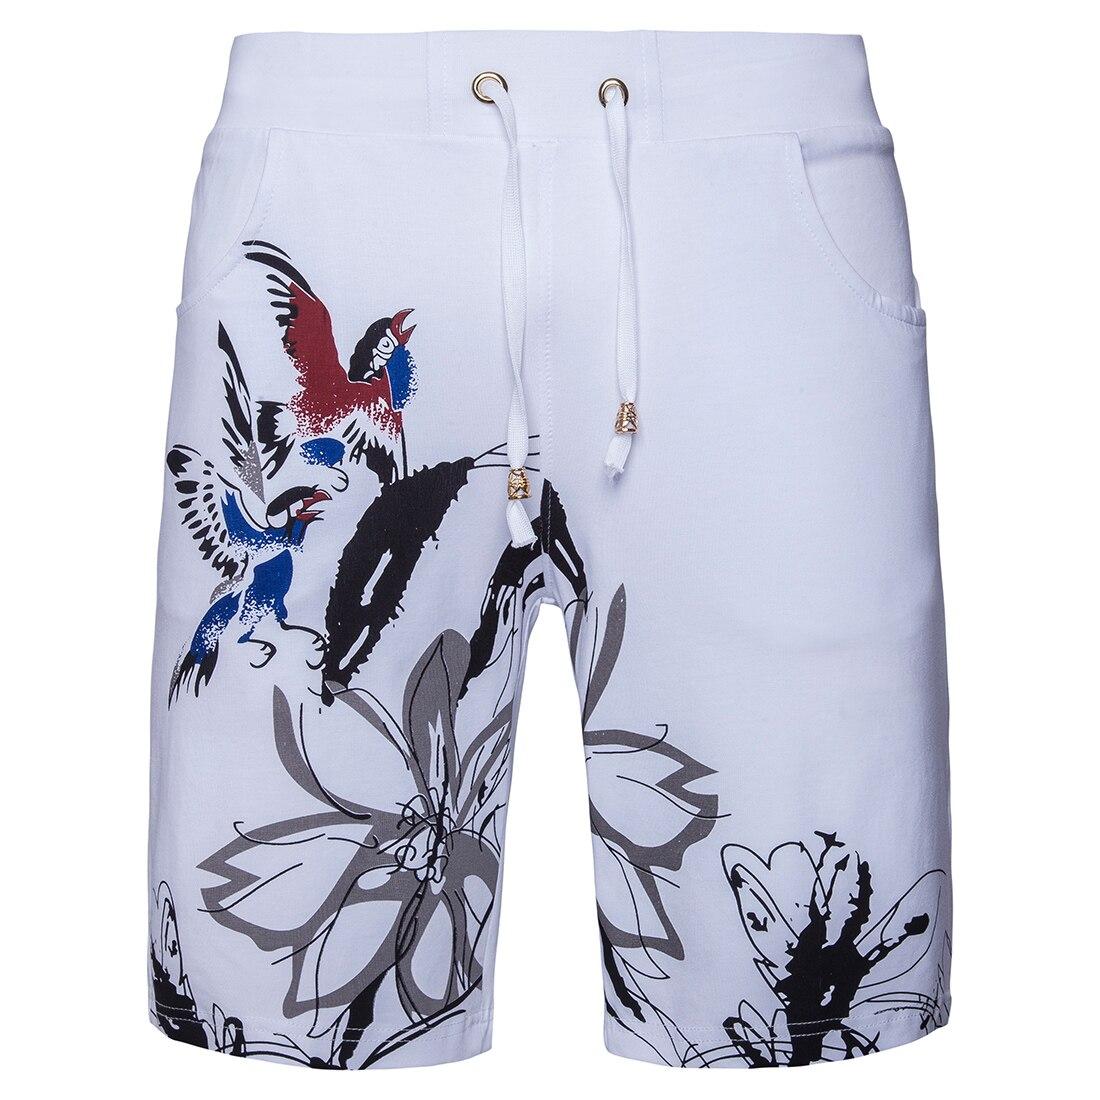 2018 Summer Mens White Stretch Cotton Shorts, Fashion Casual Drawstring Shorts Men High Quality Man Flower Shorts S-2XL